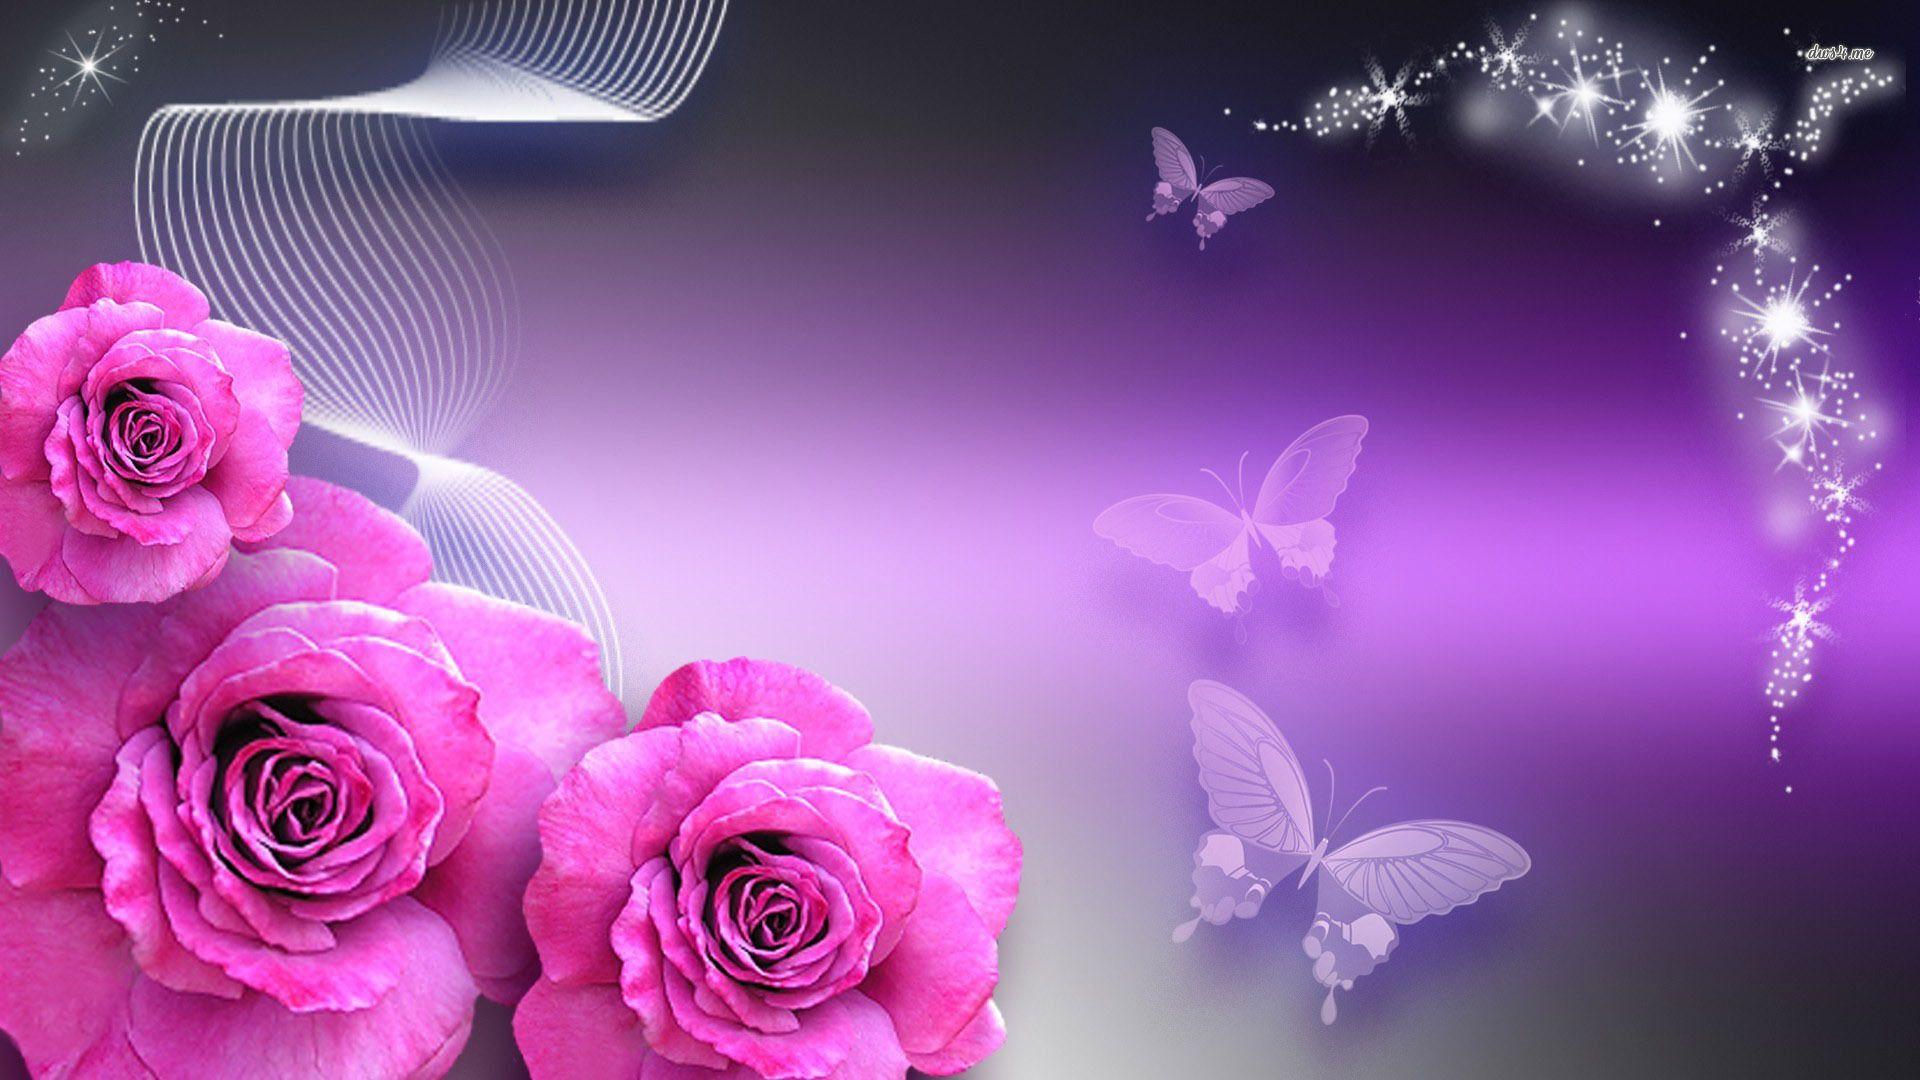 Purple Rose Background Rose Wallpaper Purple Roses Wallpaper Coolest rose flower hd wallpaper